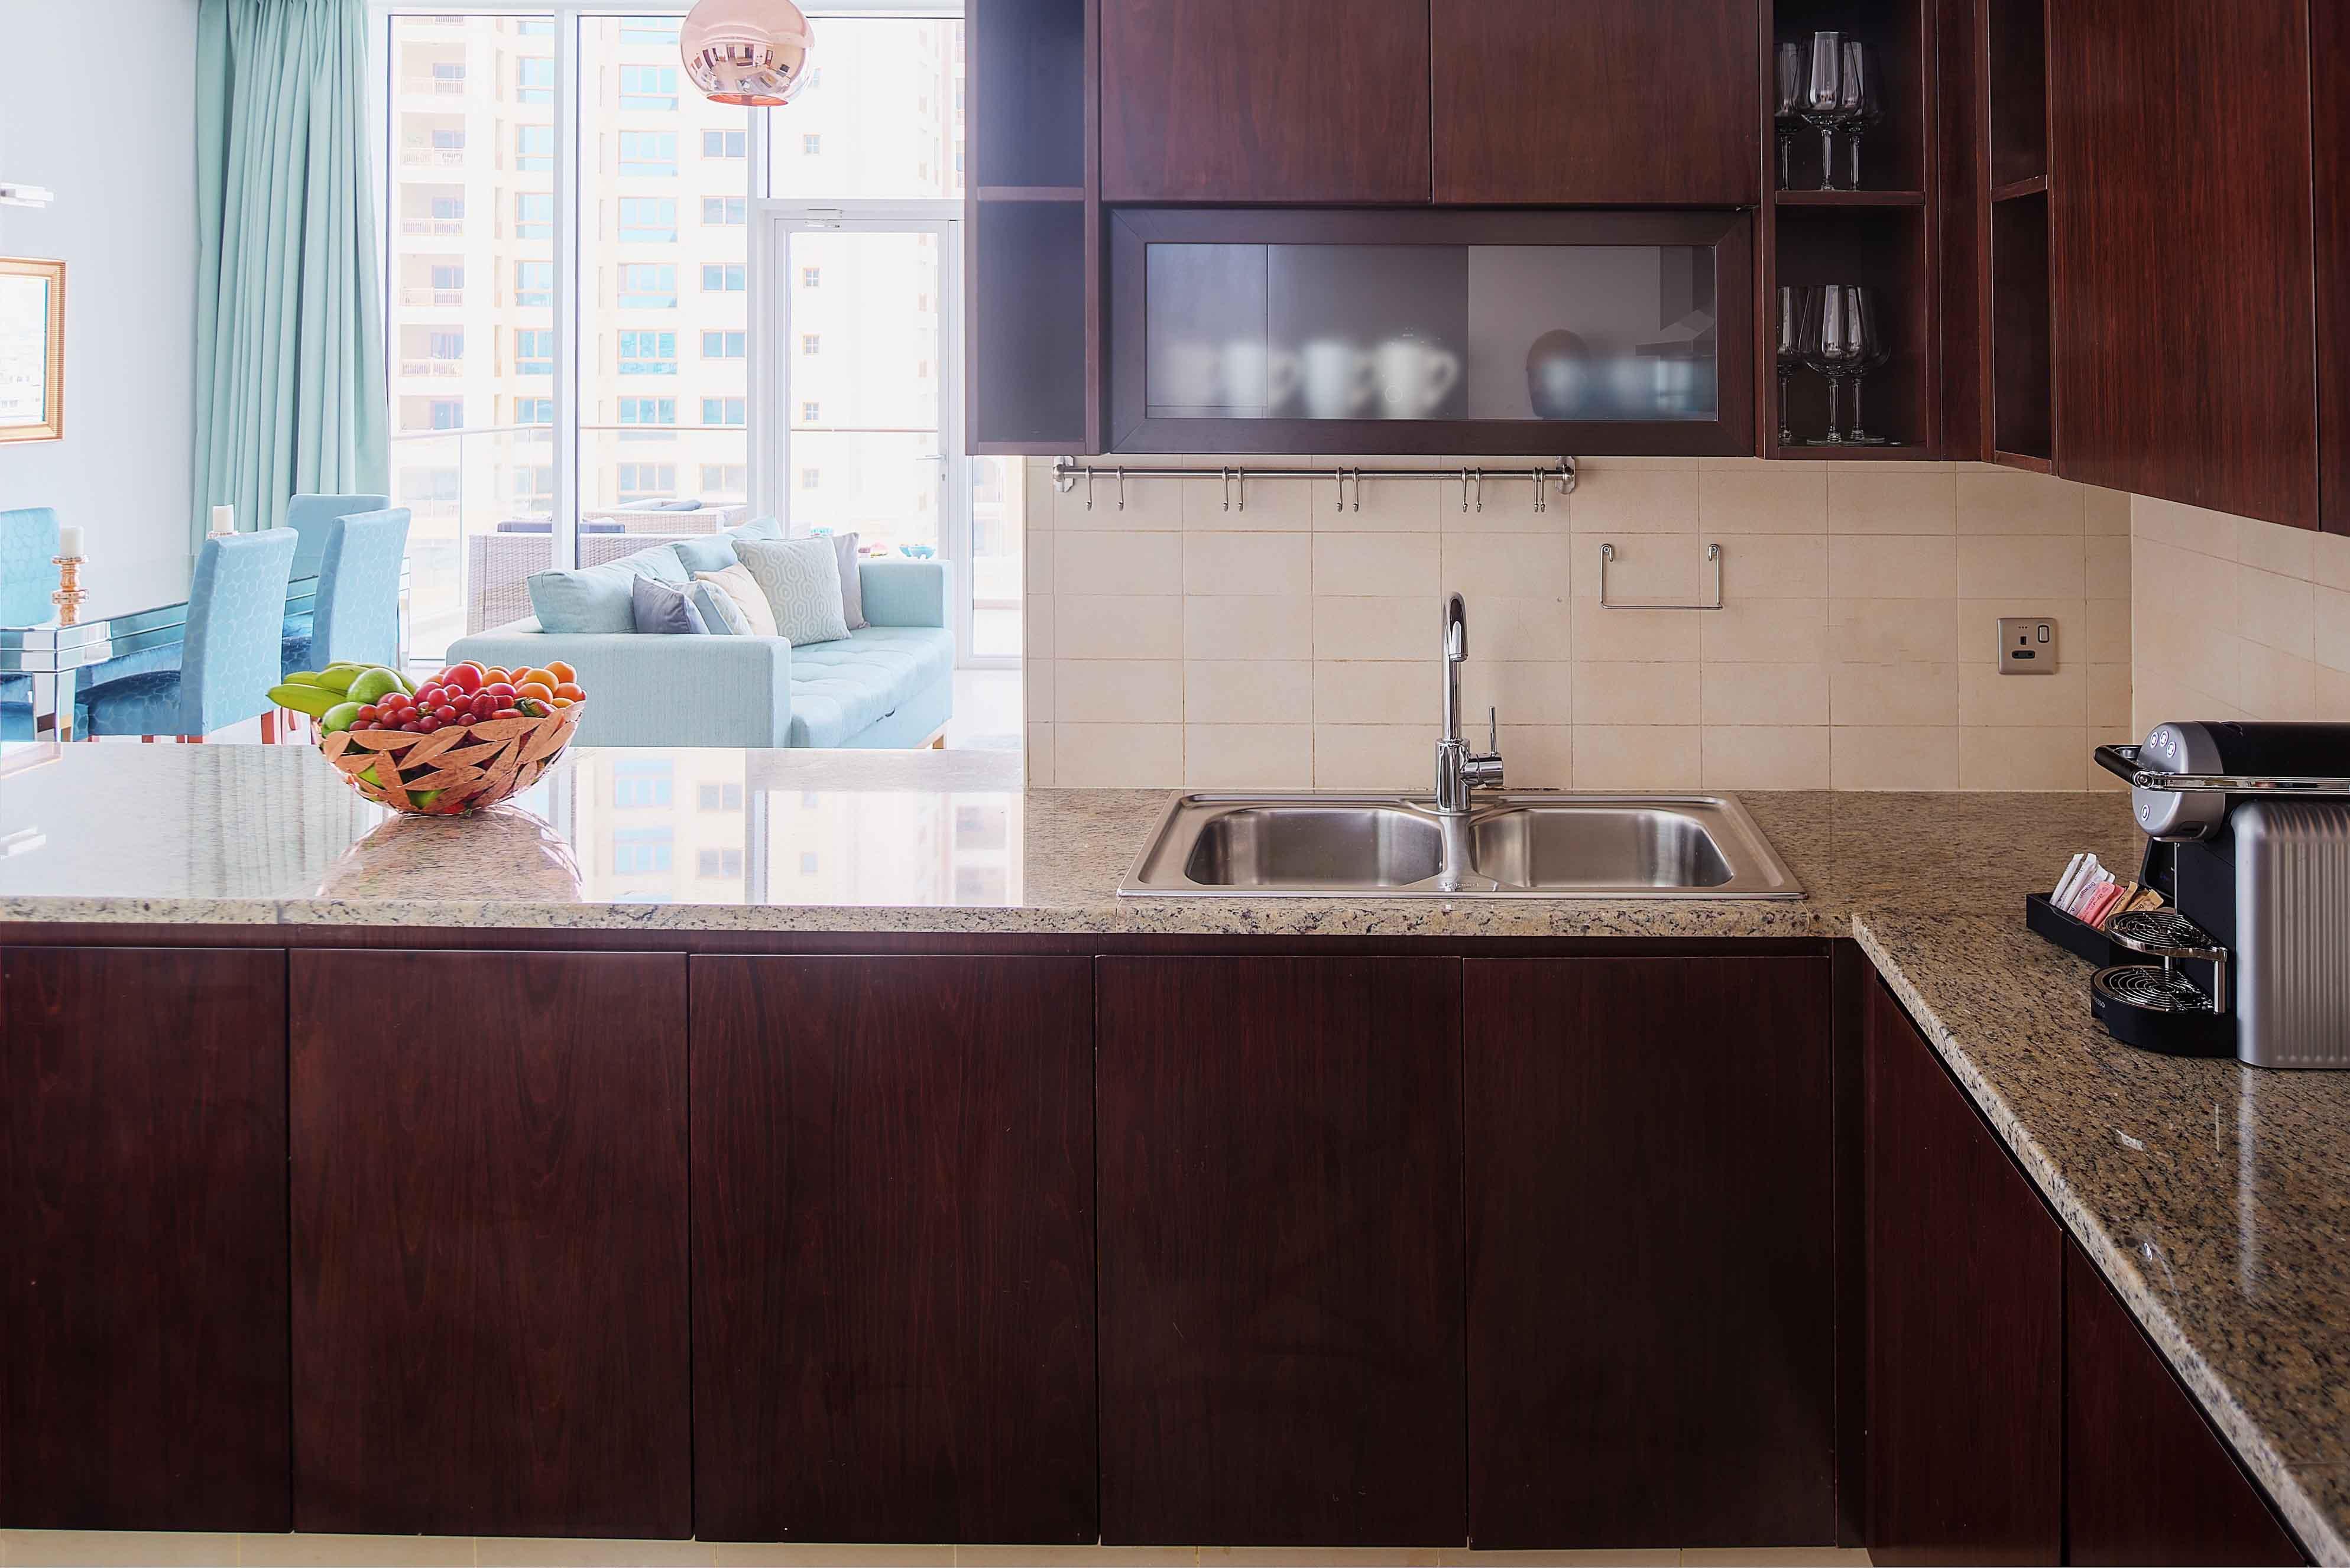 Kitchen at Tiara Tower Apartments